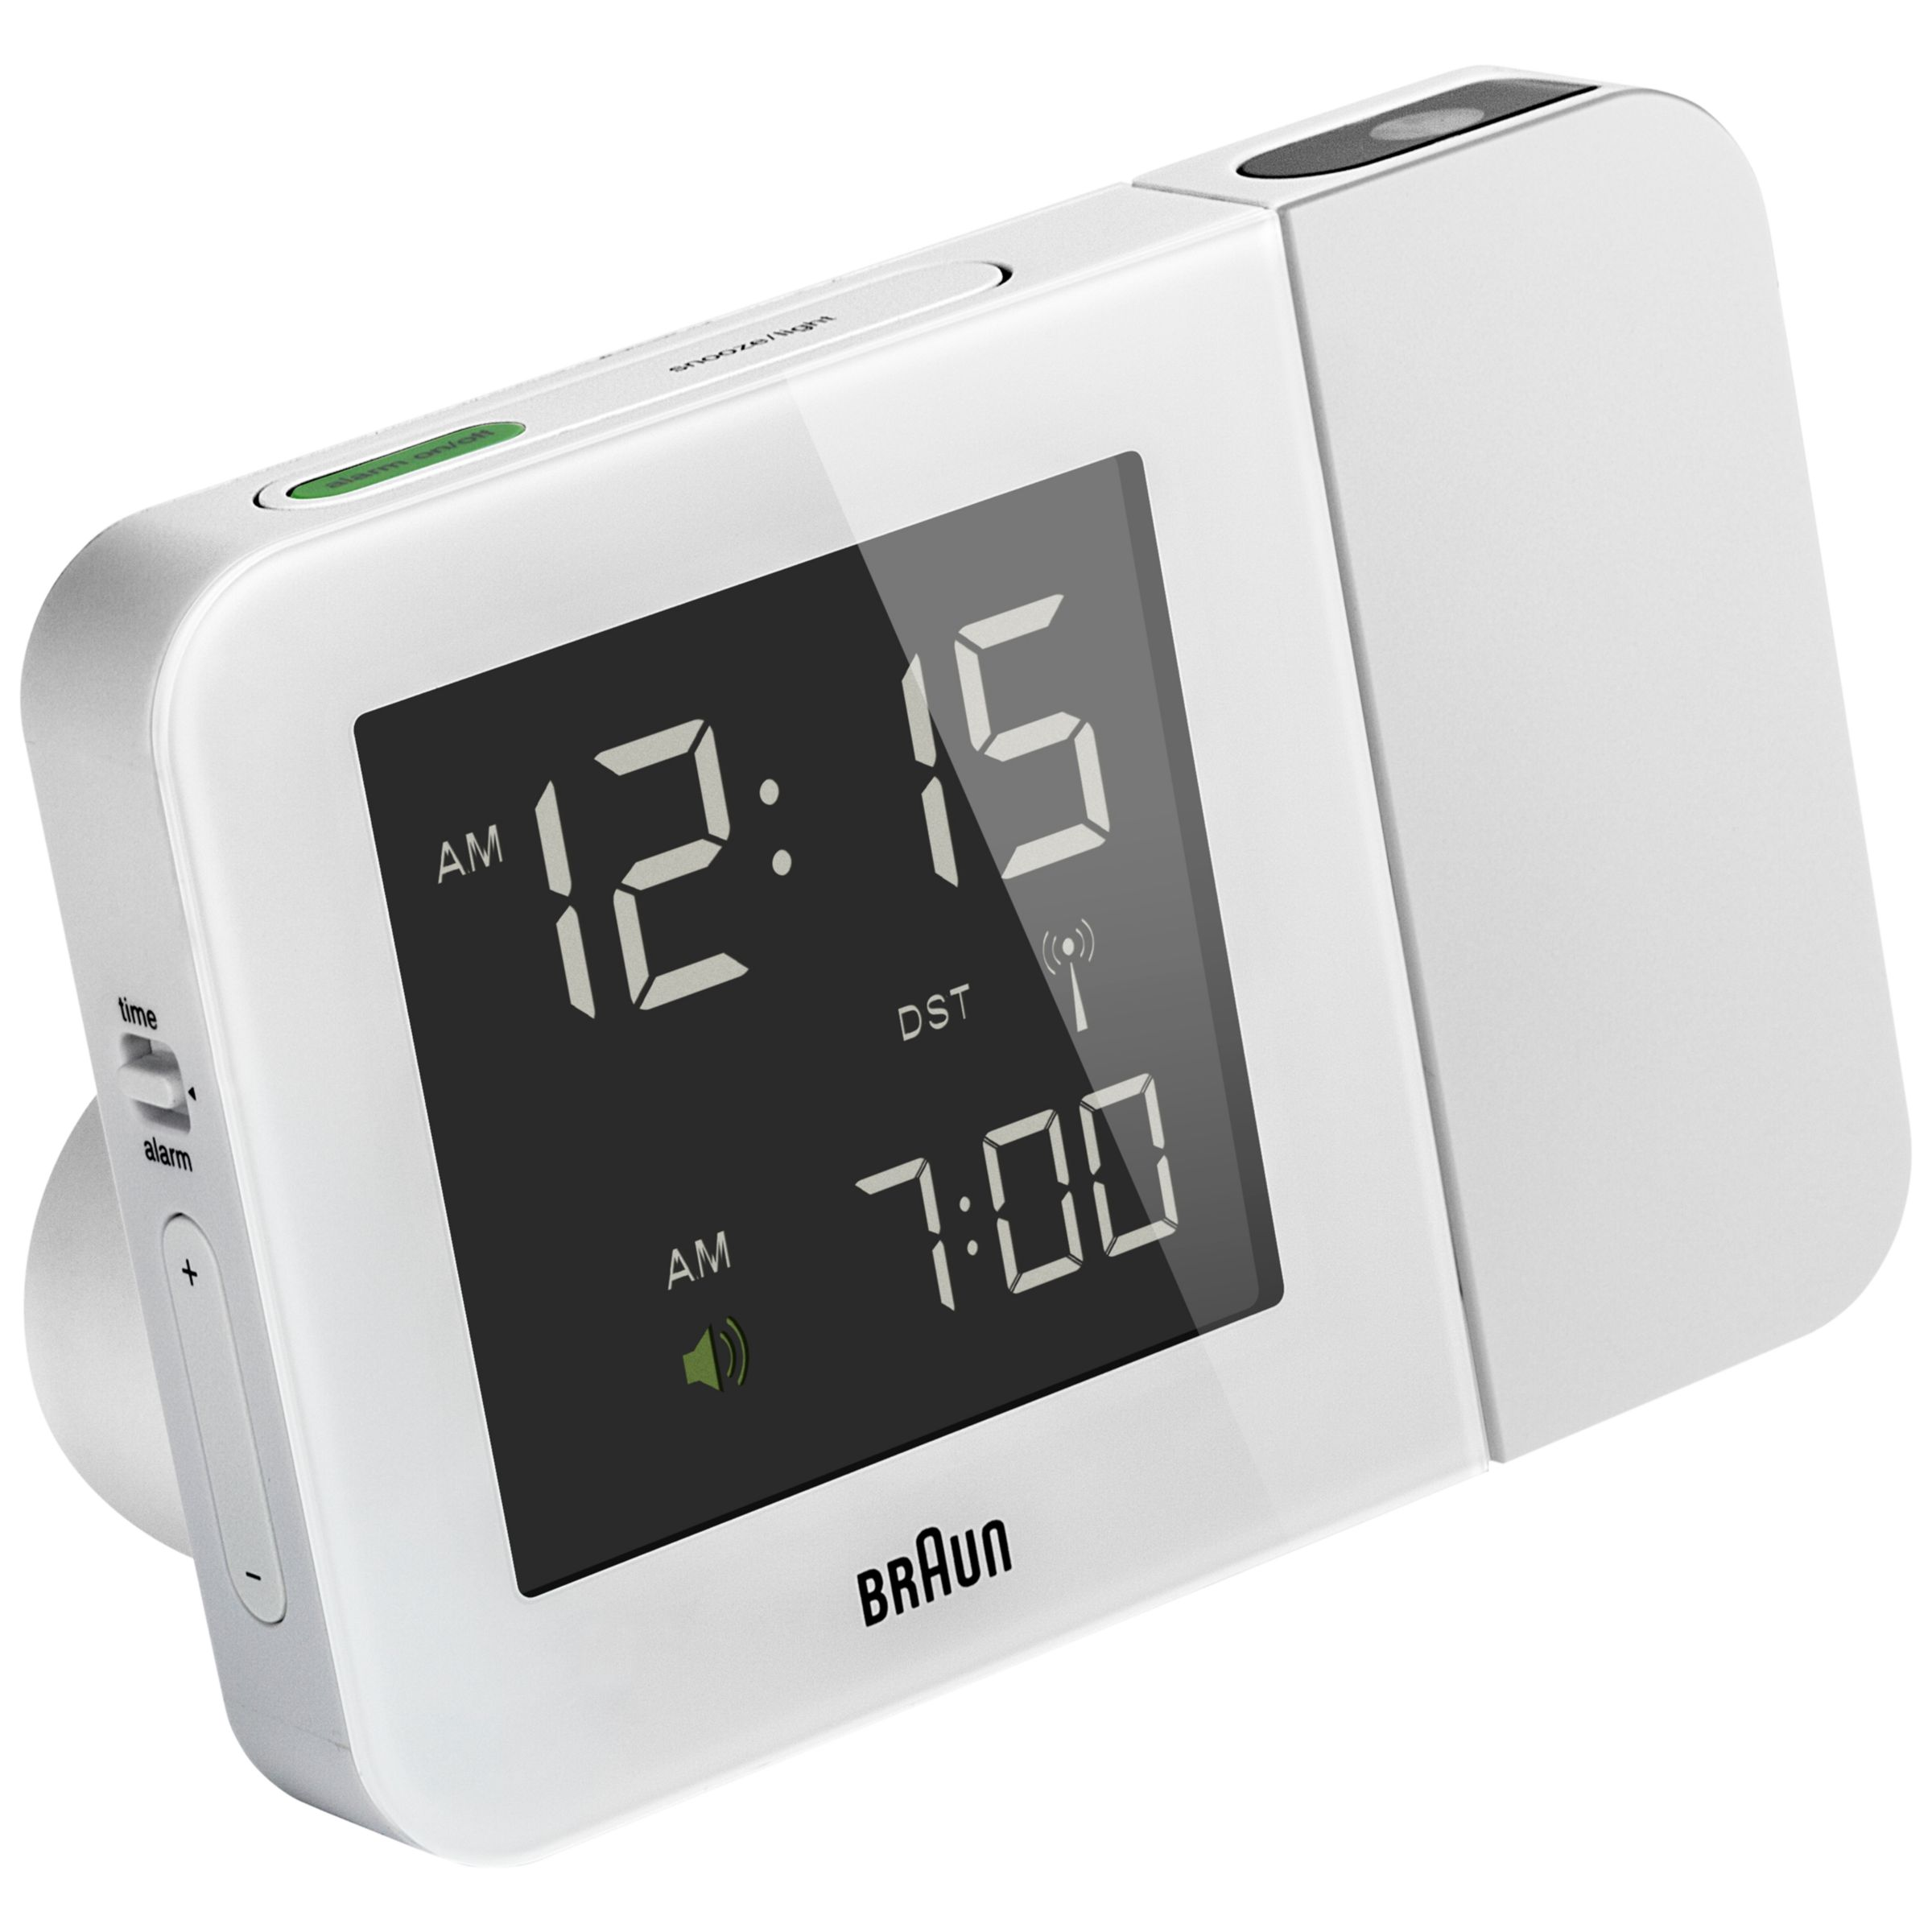 Braun Braun Projection Radio Controlled Alarm Clock